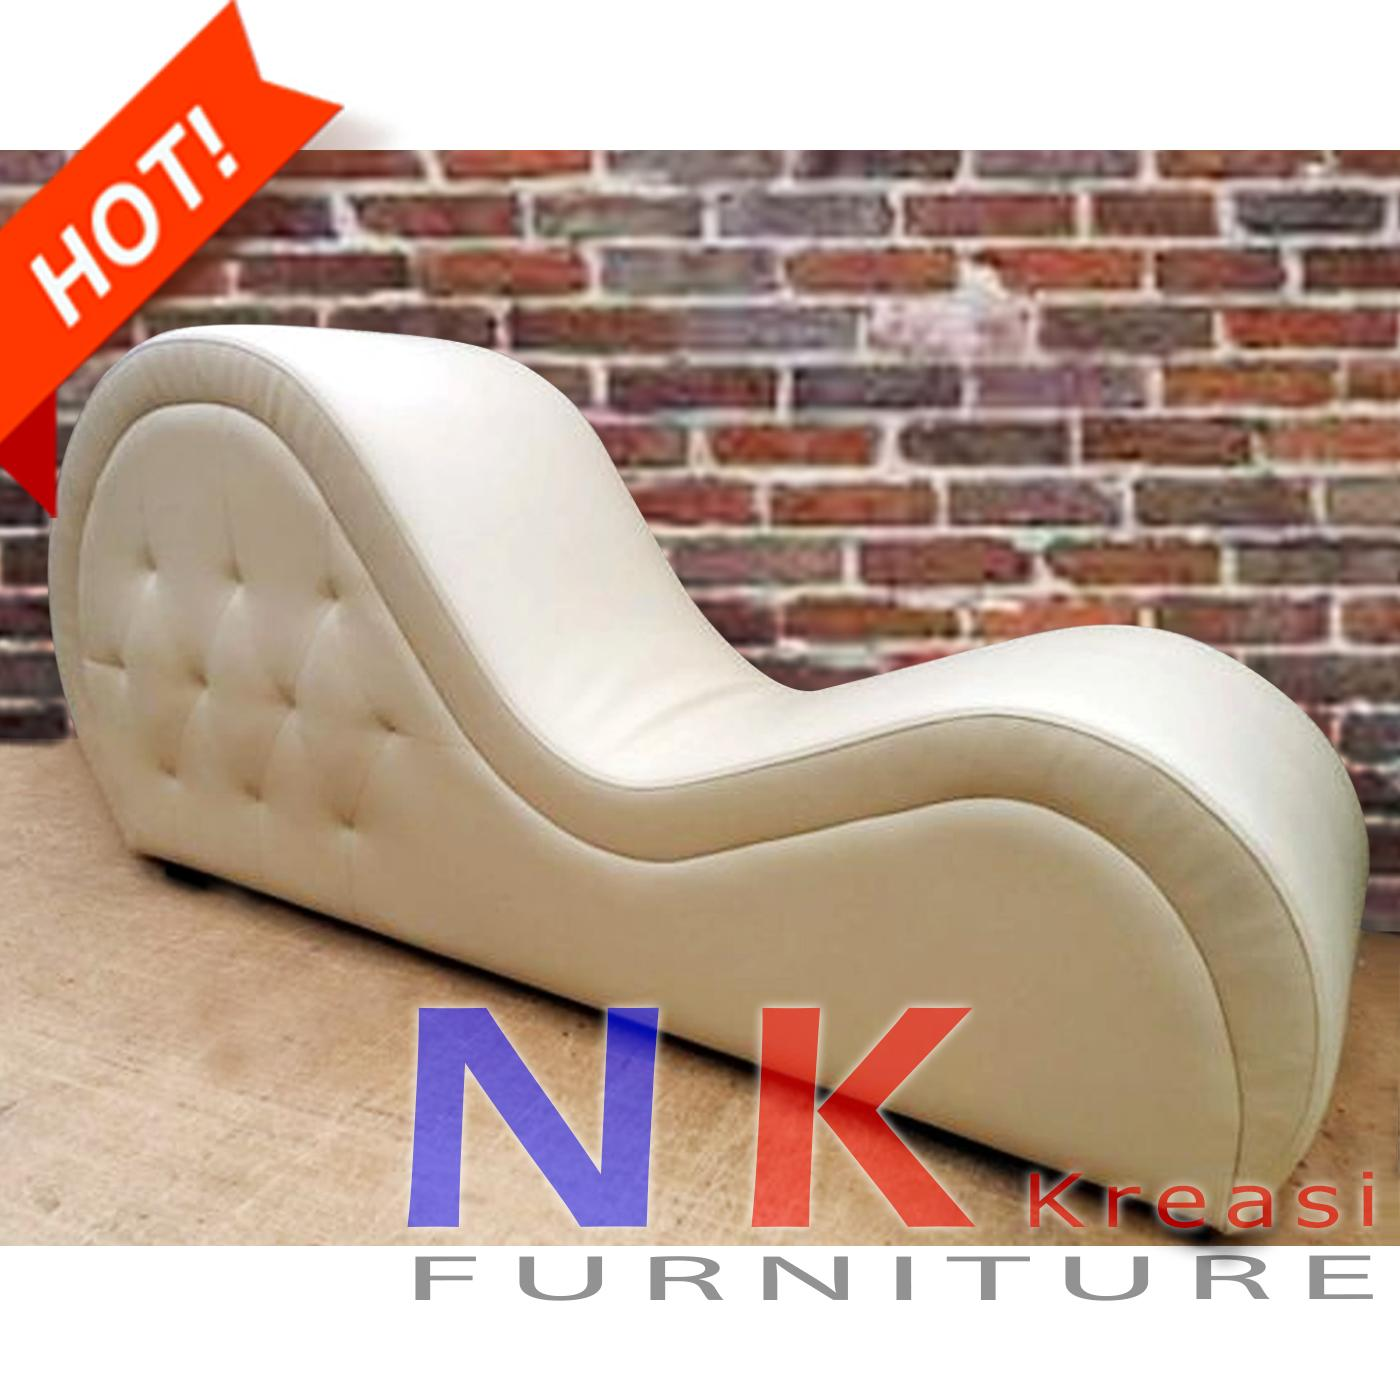 Kursi Tantra, Tantra Chair, Kursi Cinta, kursi sofa Kamasutra - JABODETABEK ONLY